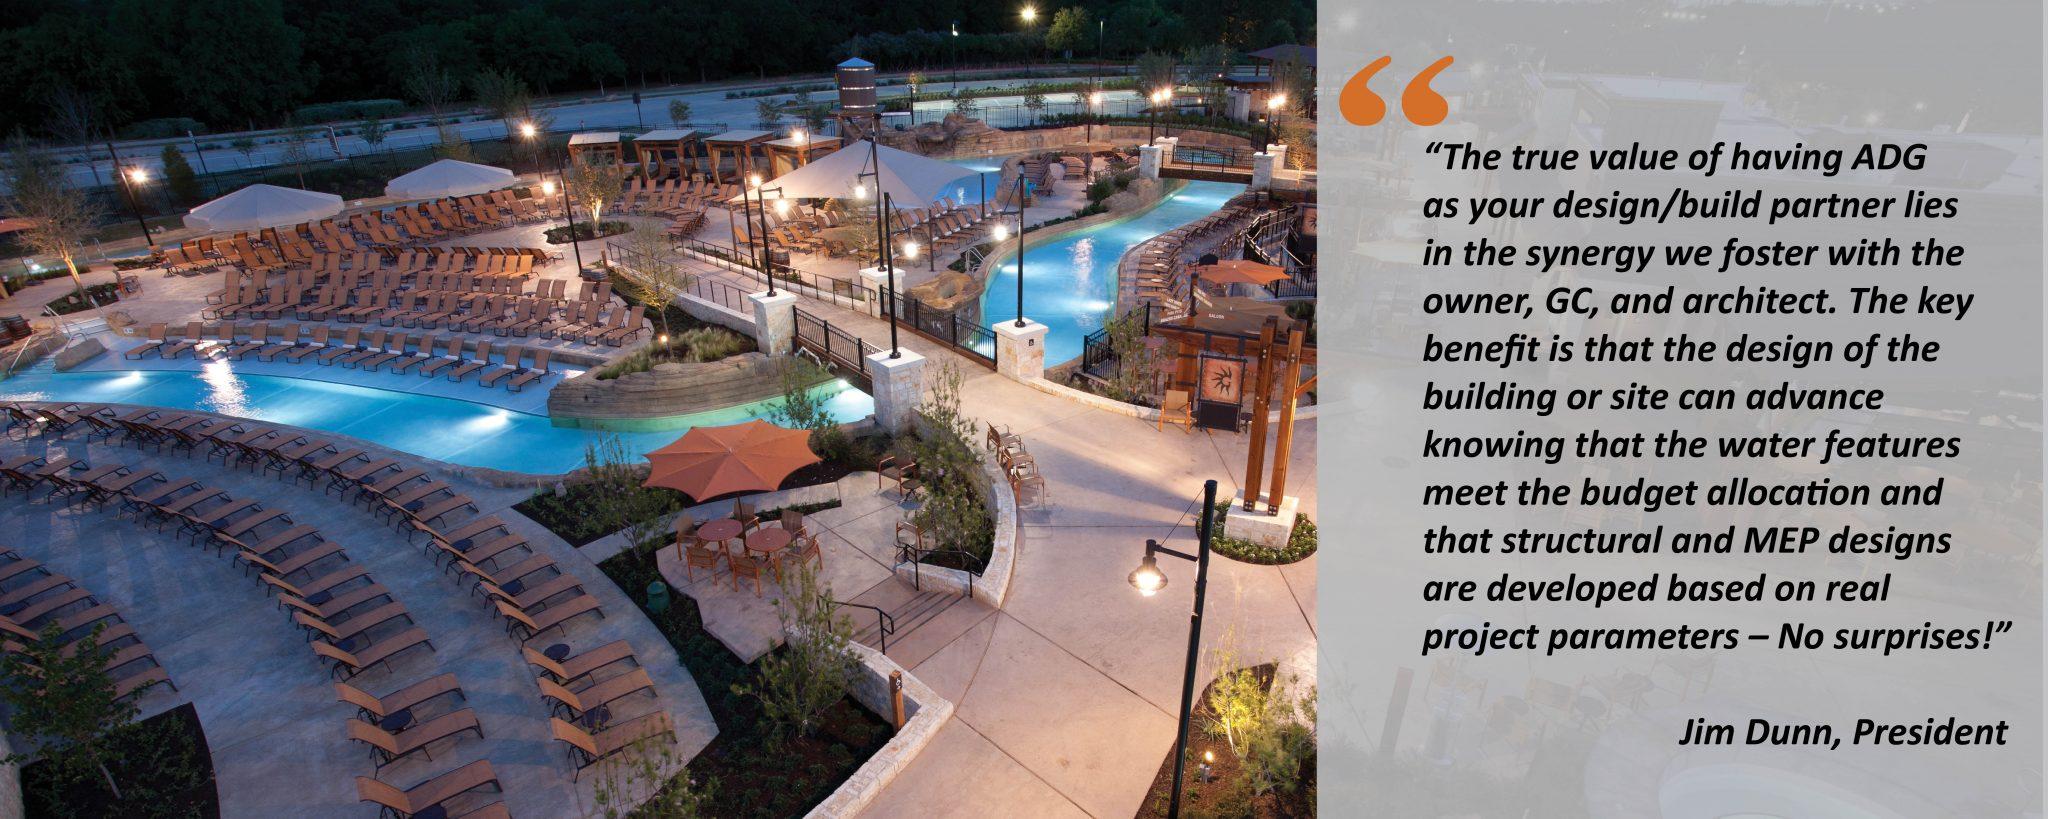 resort water area quotation